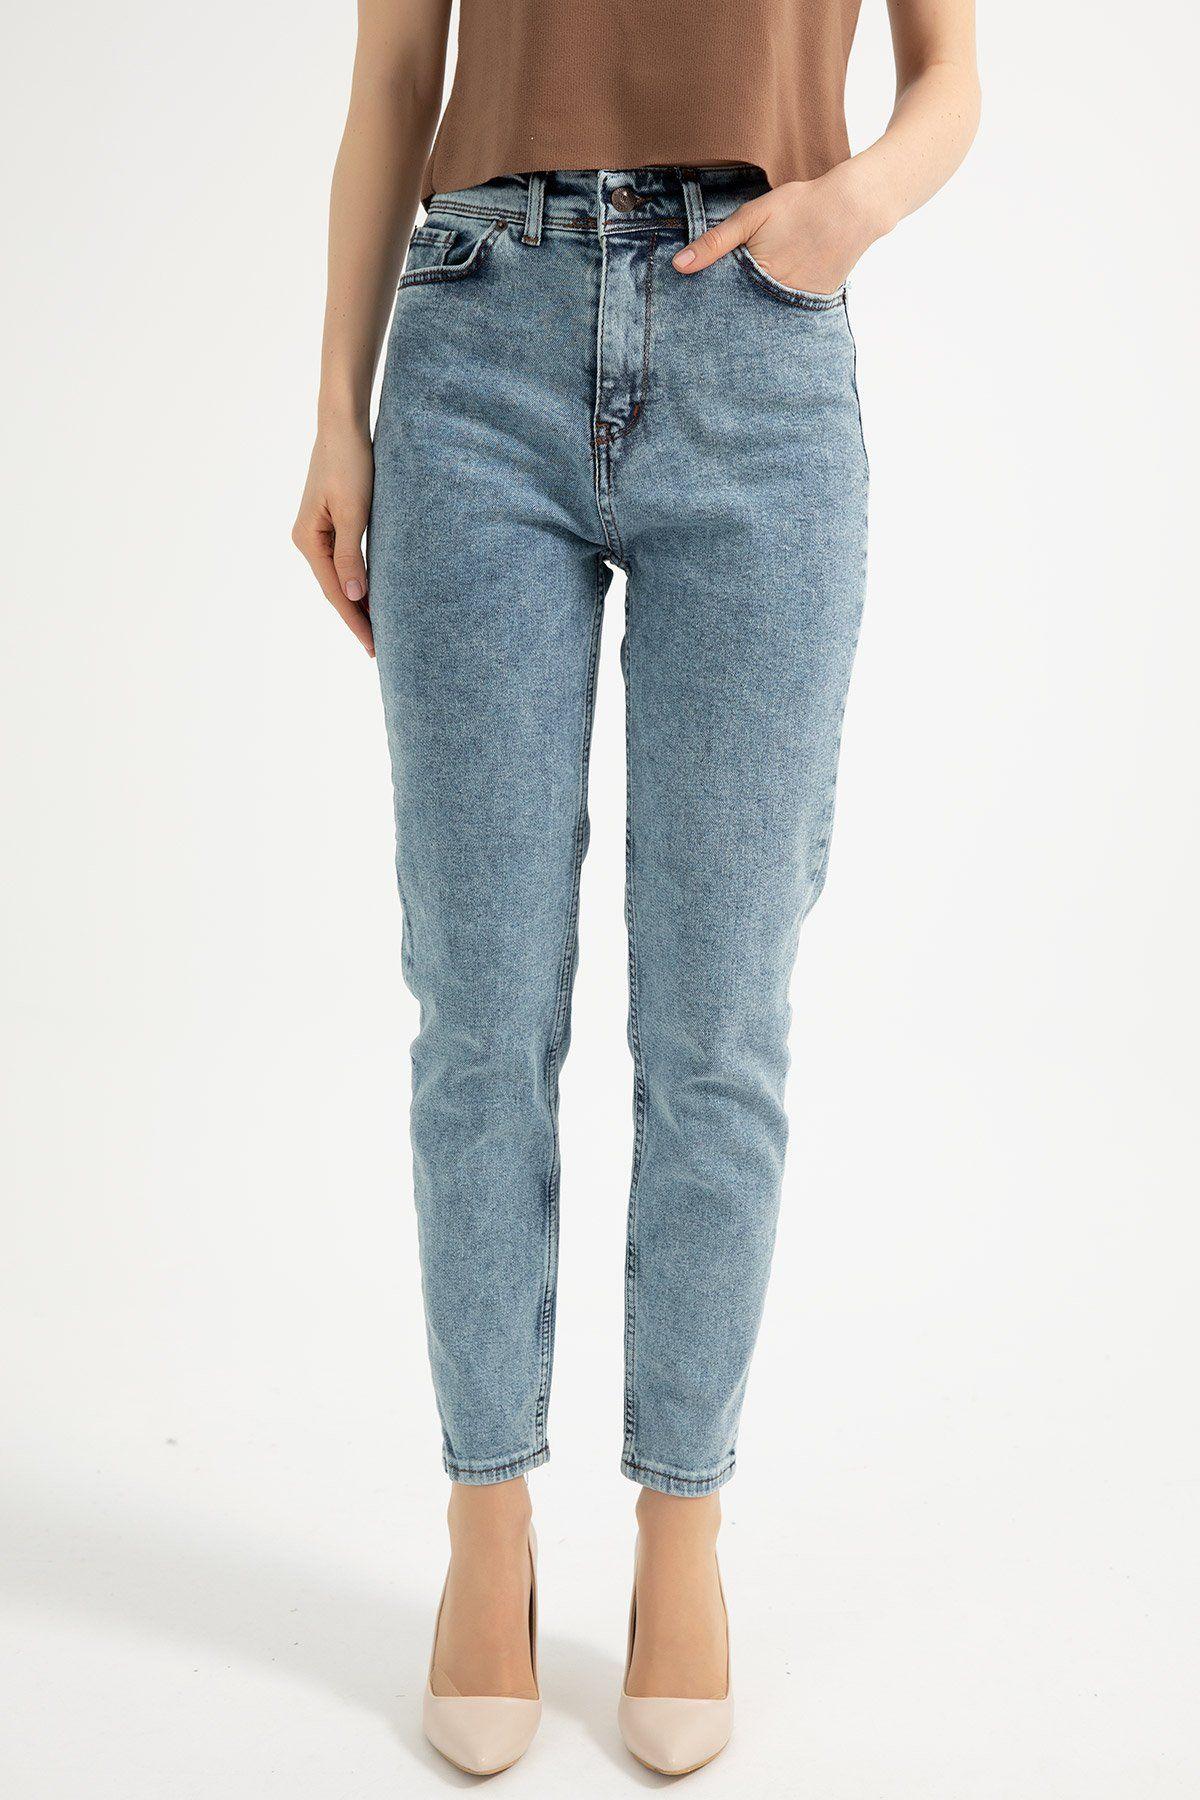 Boot Cut Pants-Sky Blue